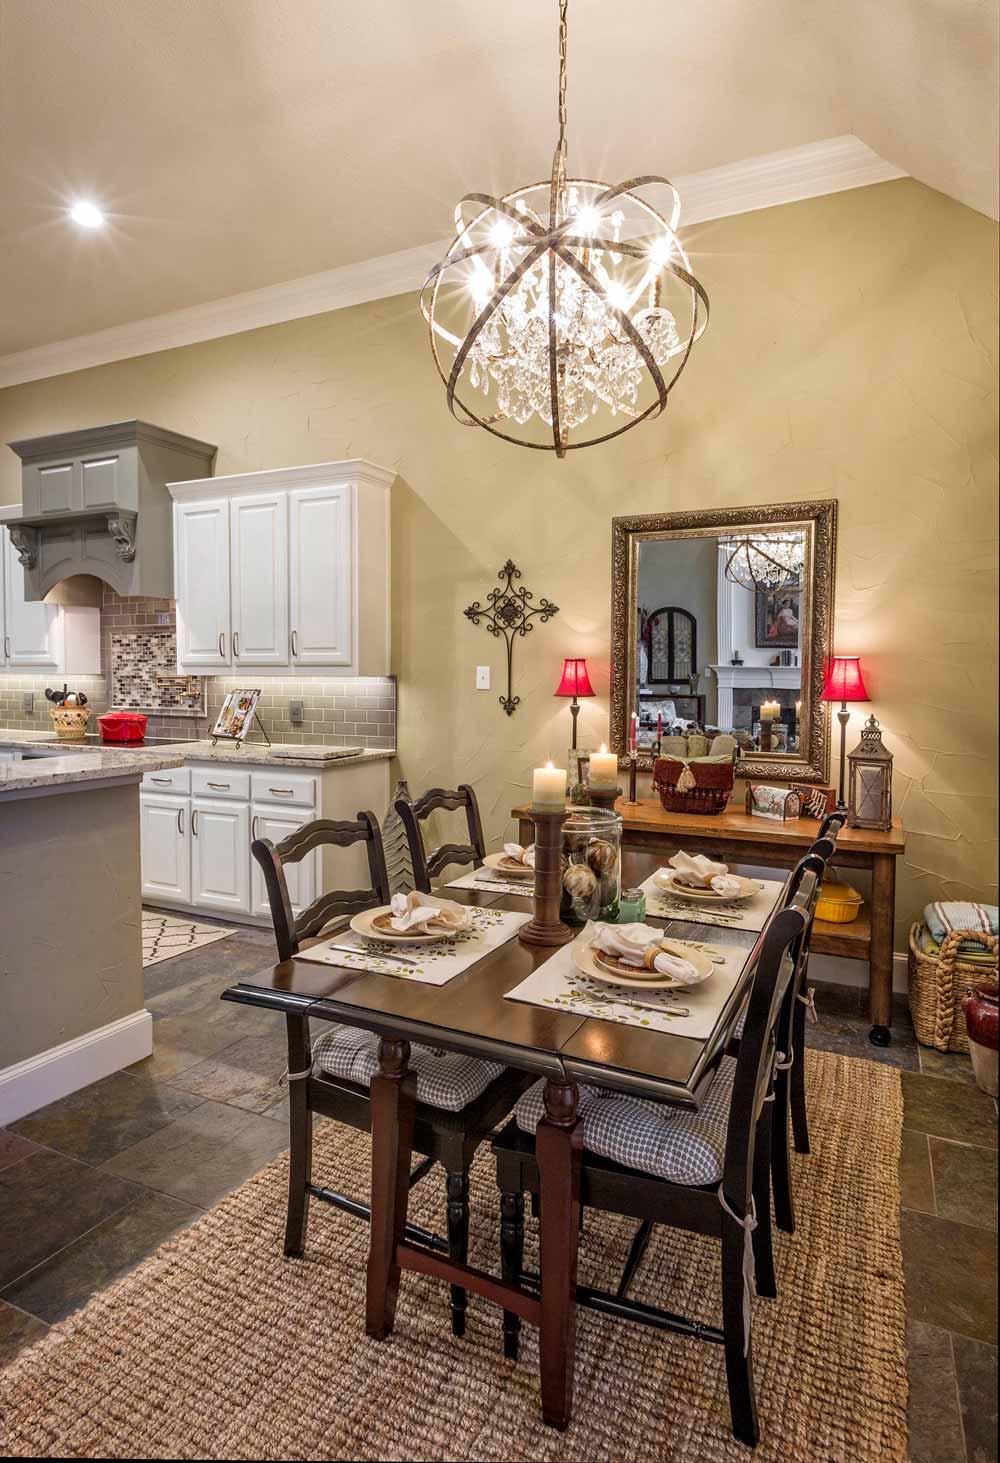 Arizona-tile-Home-maintenance-Flower-Mound-TX-75022